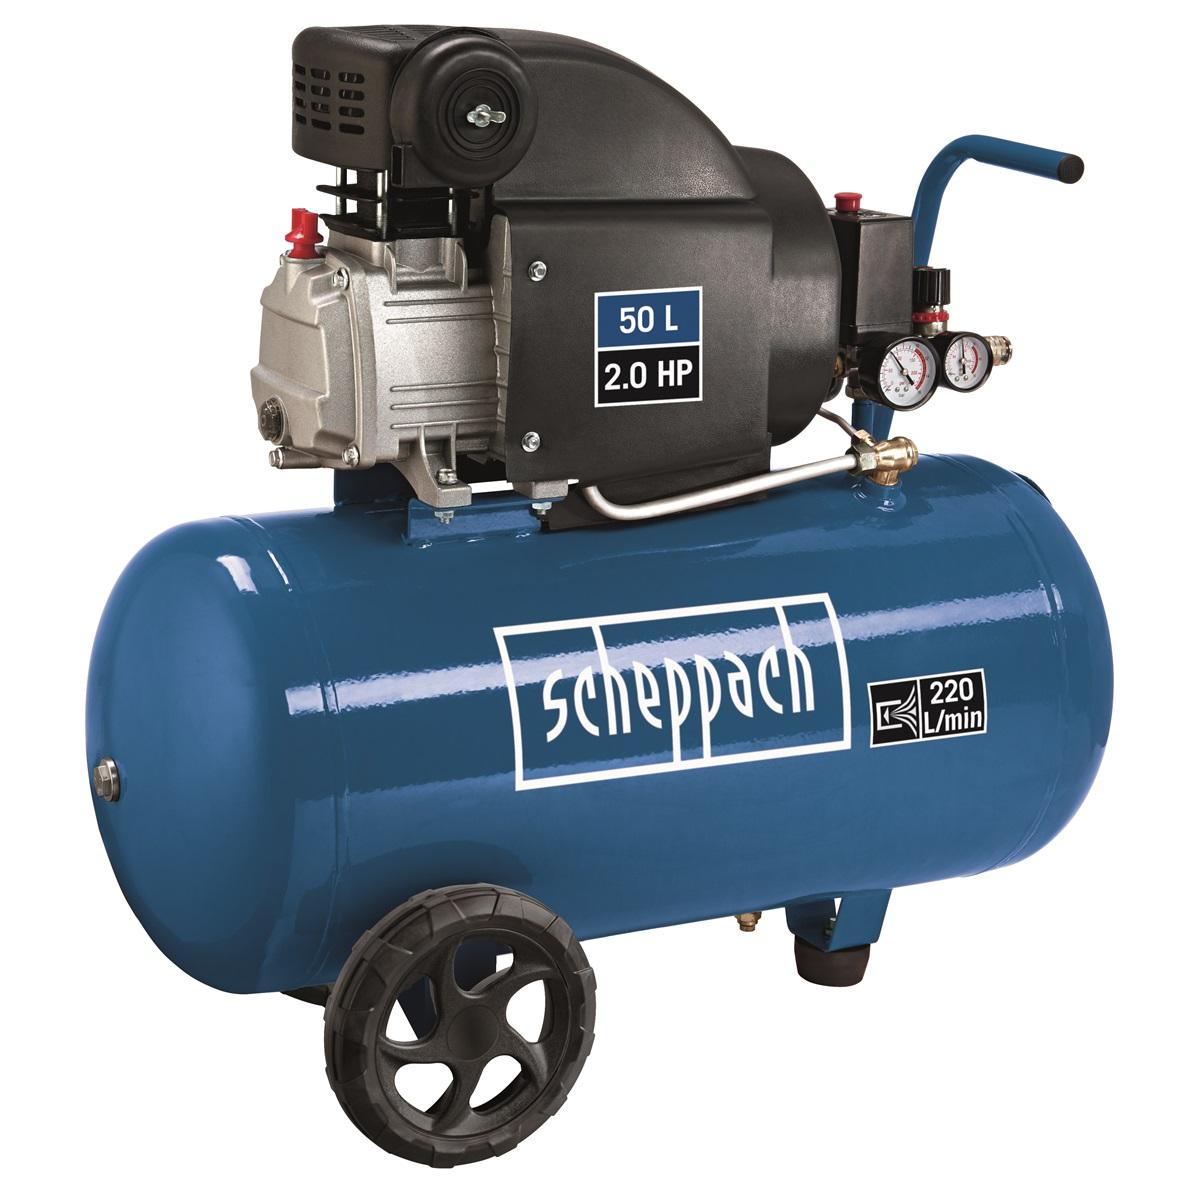 Scheppach HC 54, olejový kompresor 50 l